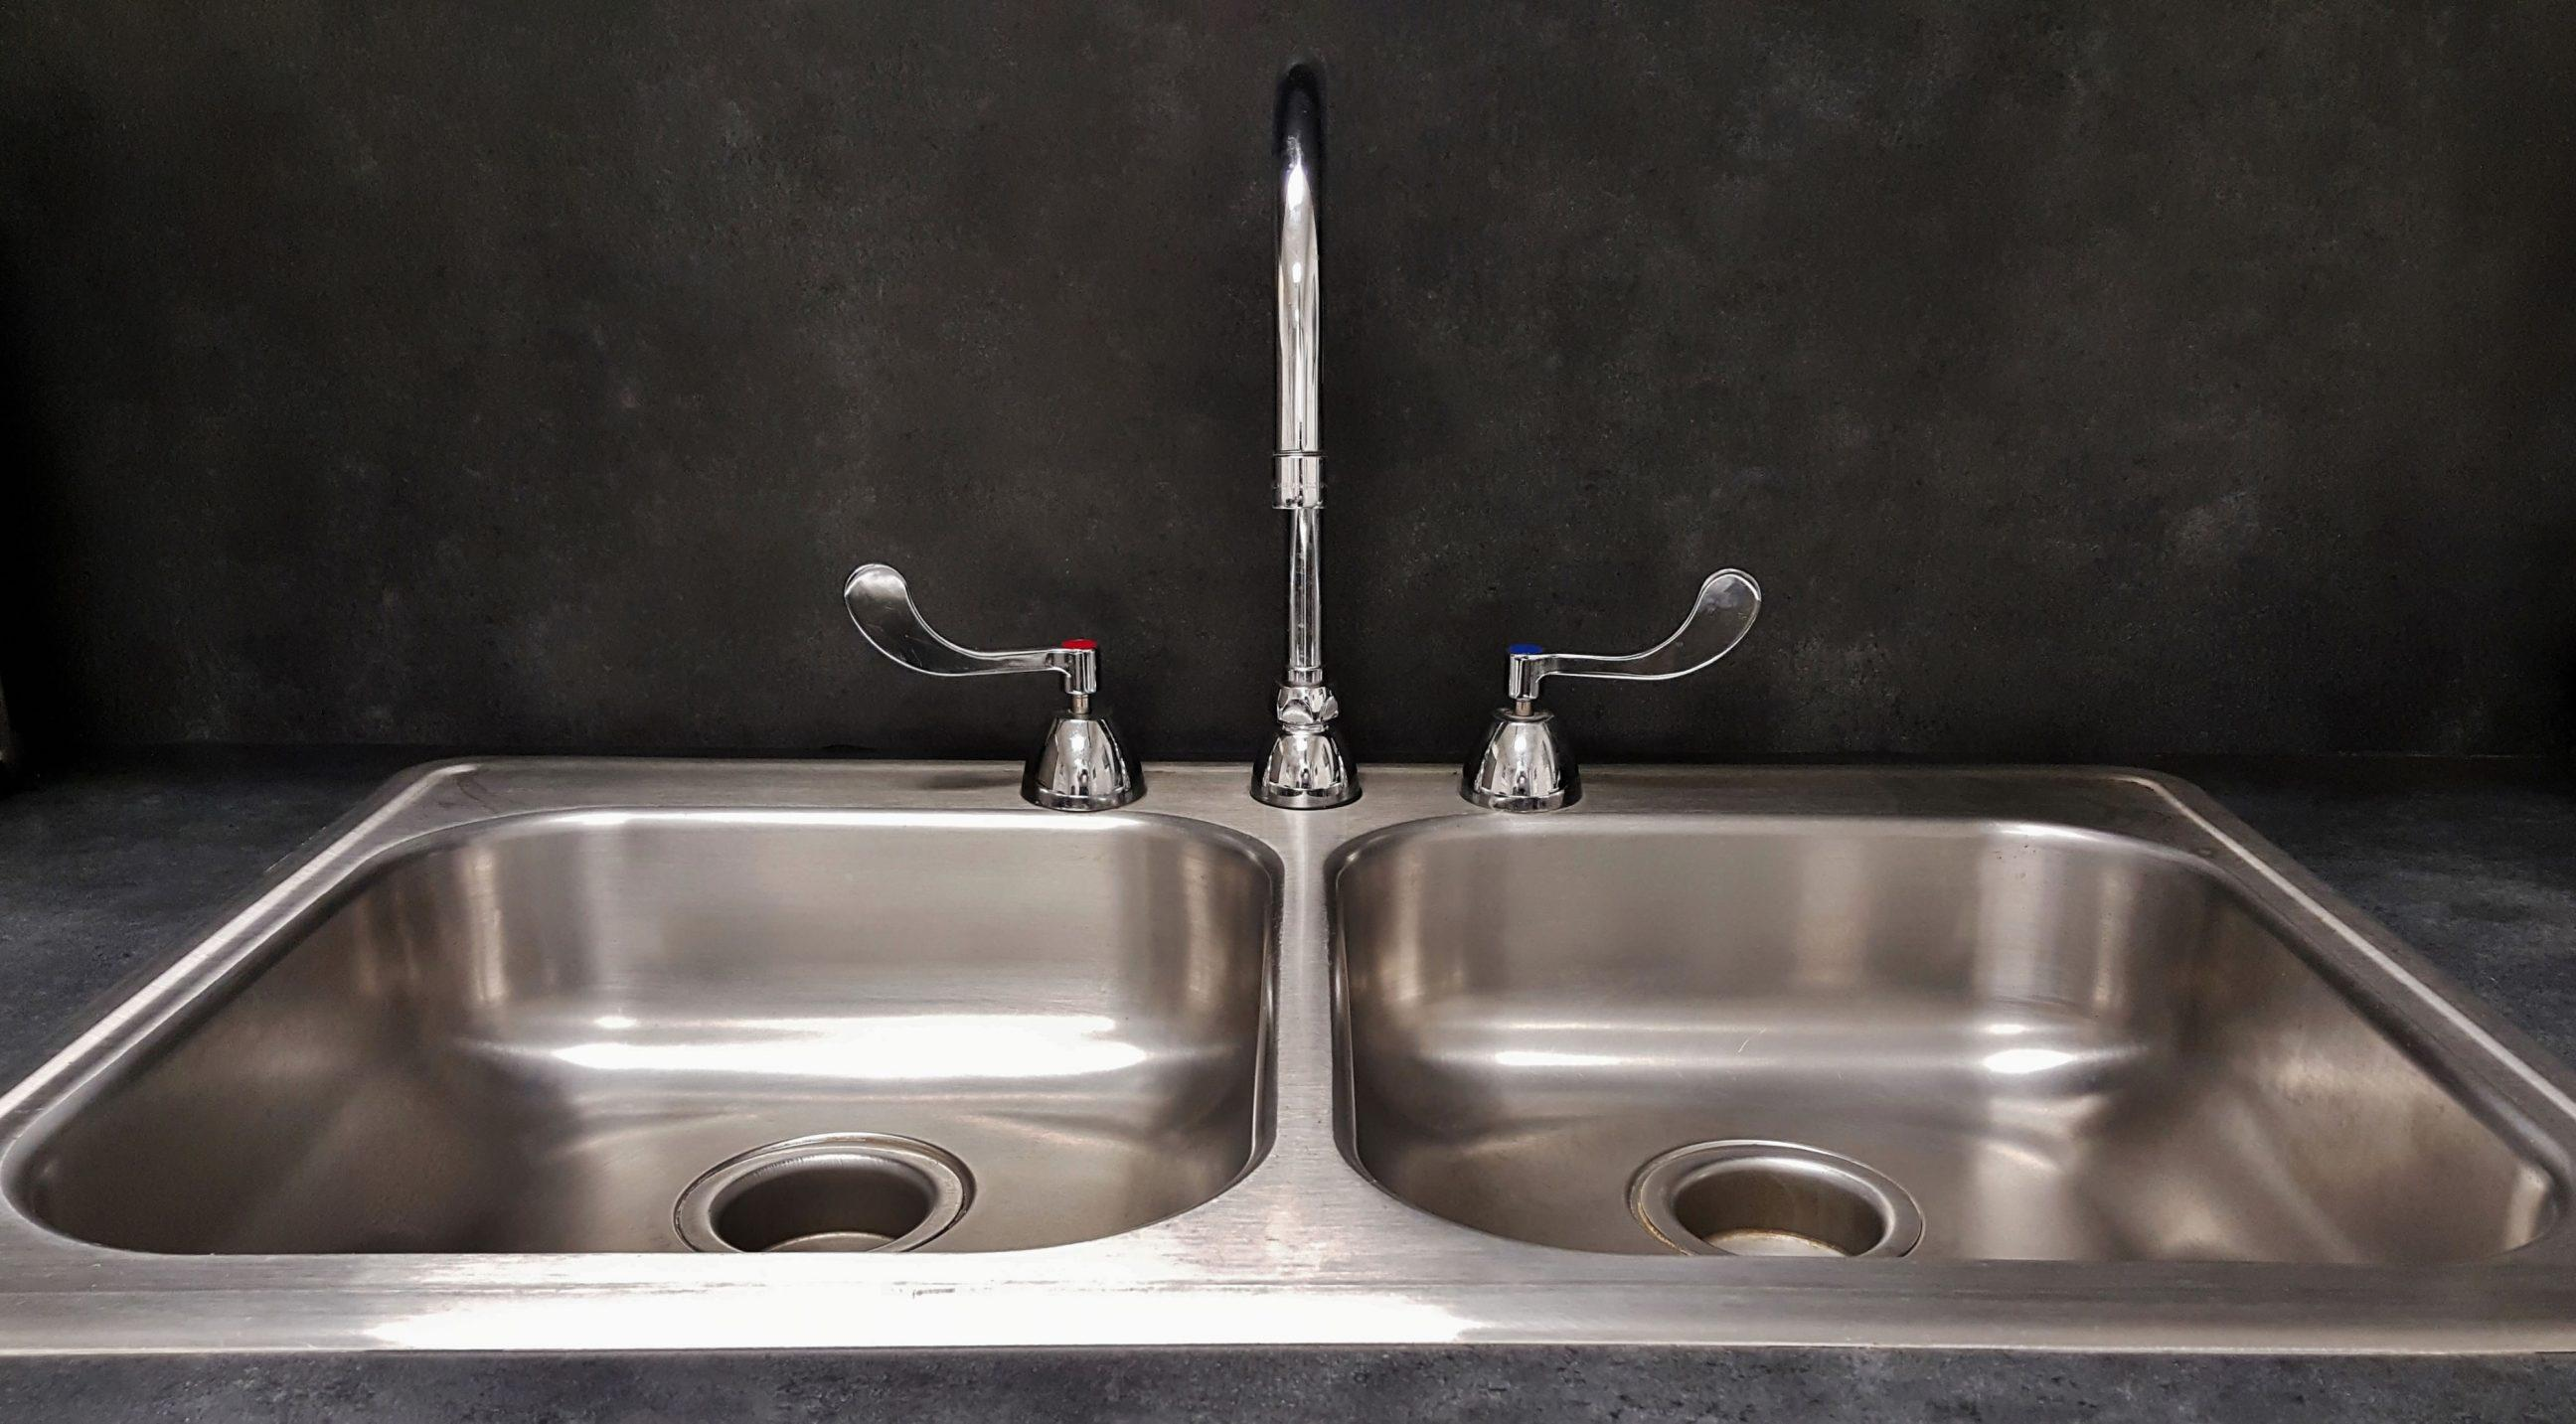 Double basin kitchen sink